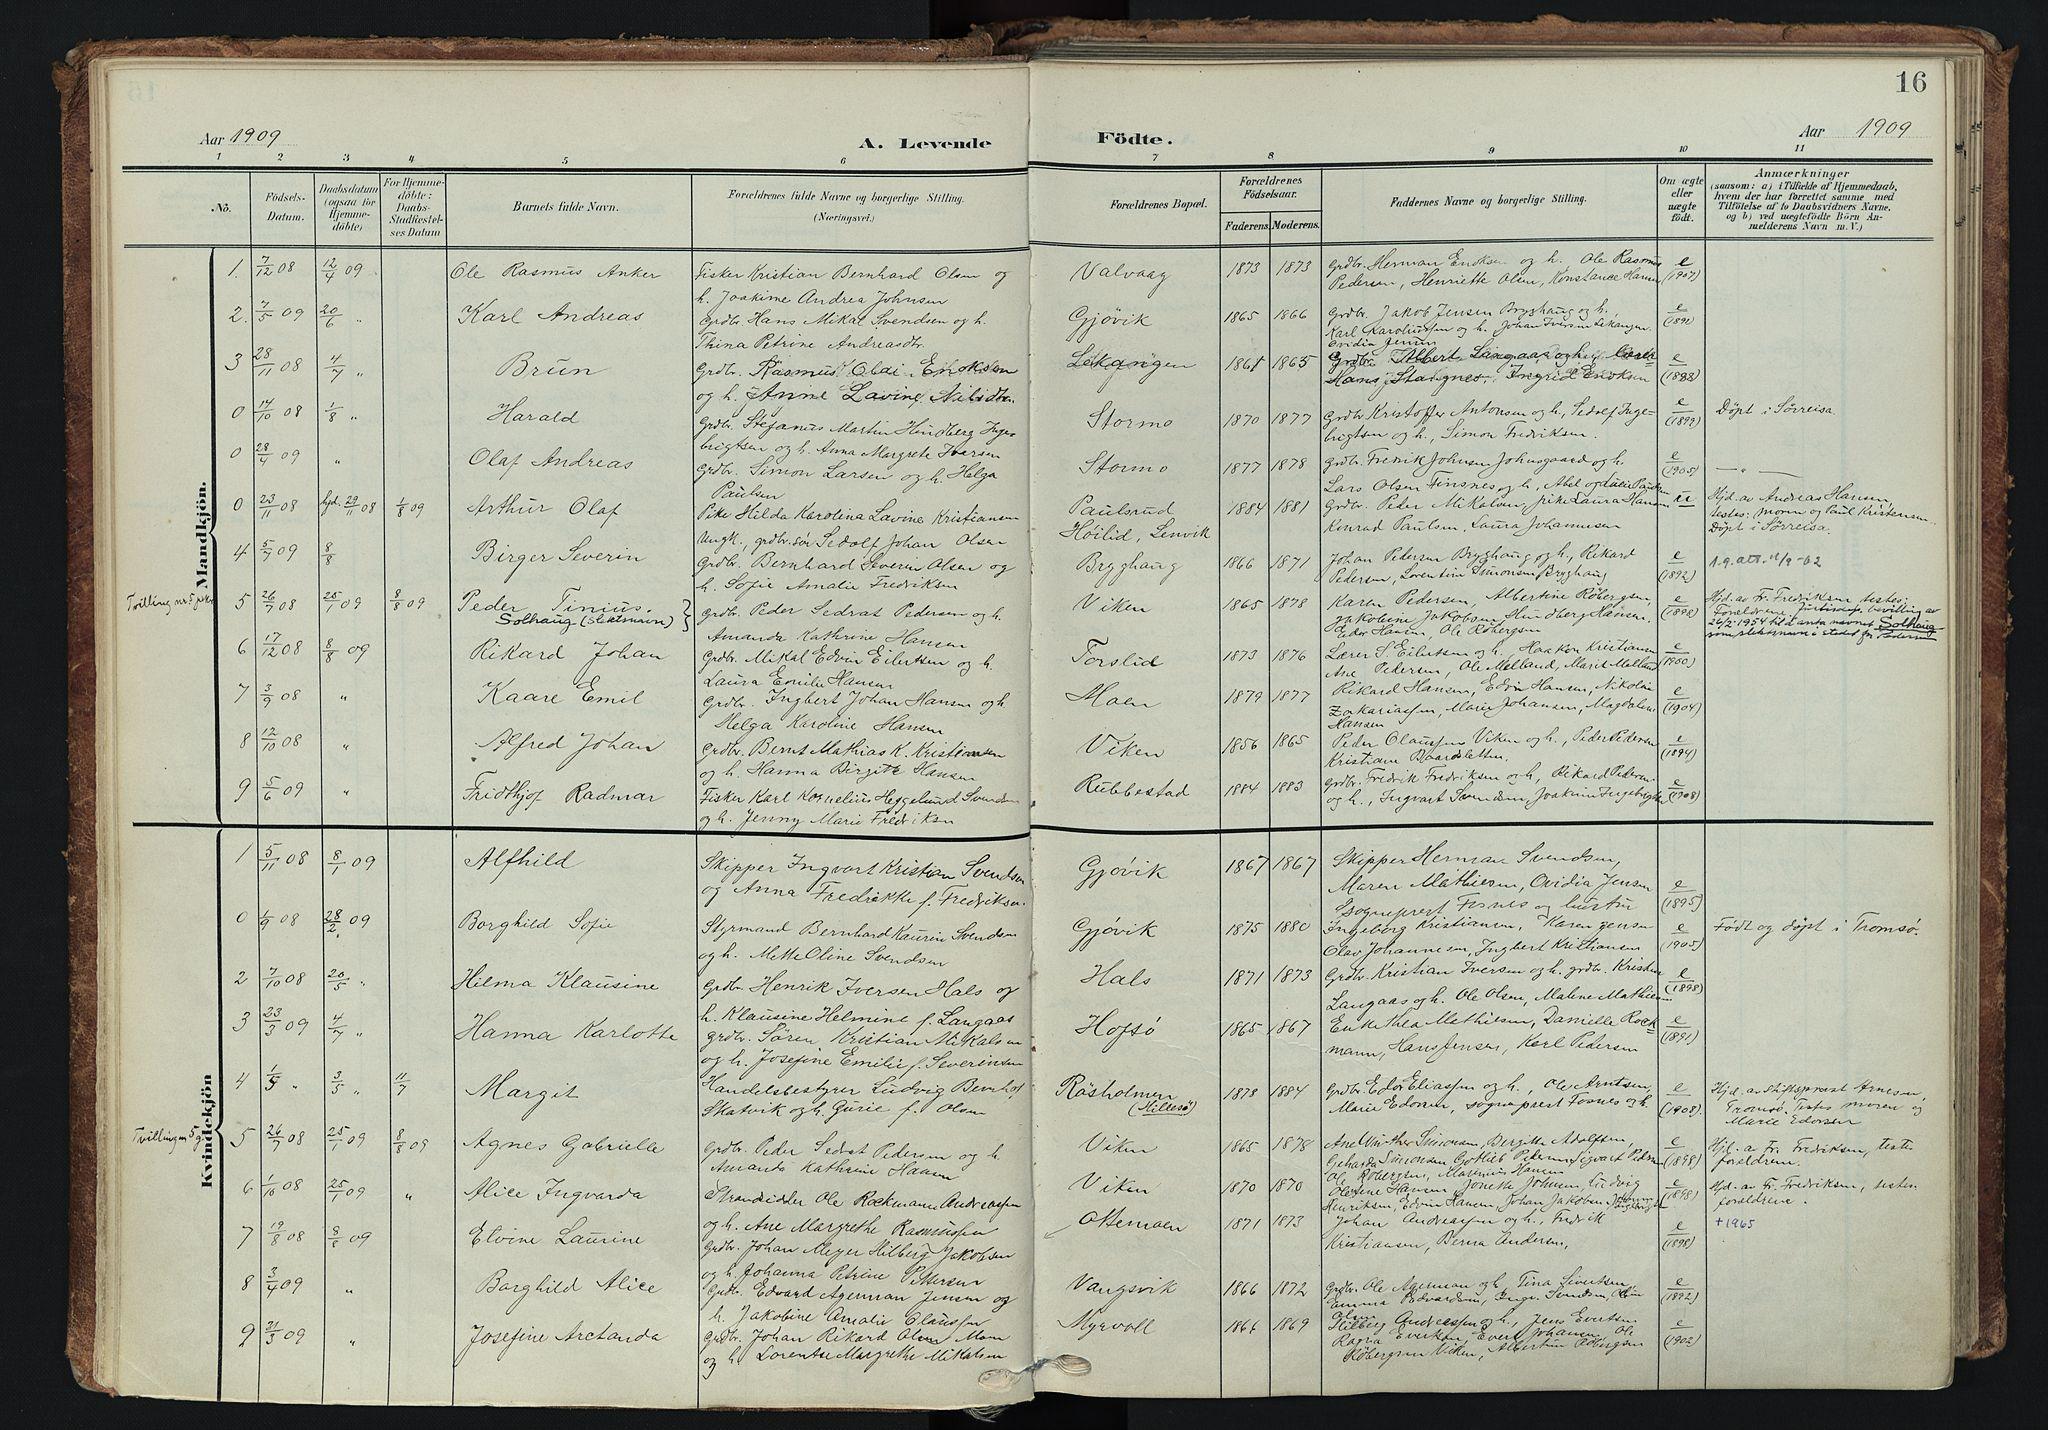 SATØ, Tranøy sokneprestkontor, I/Ia/Iaa/L0014kirke: Ministerialbok nr. 14, 1905-1919, s. 16